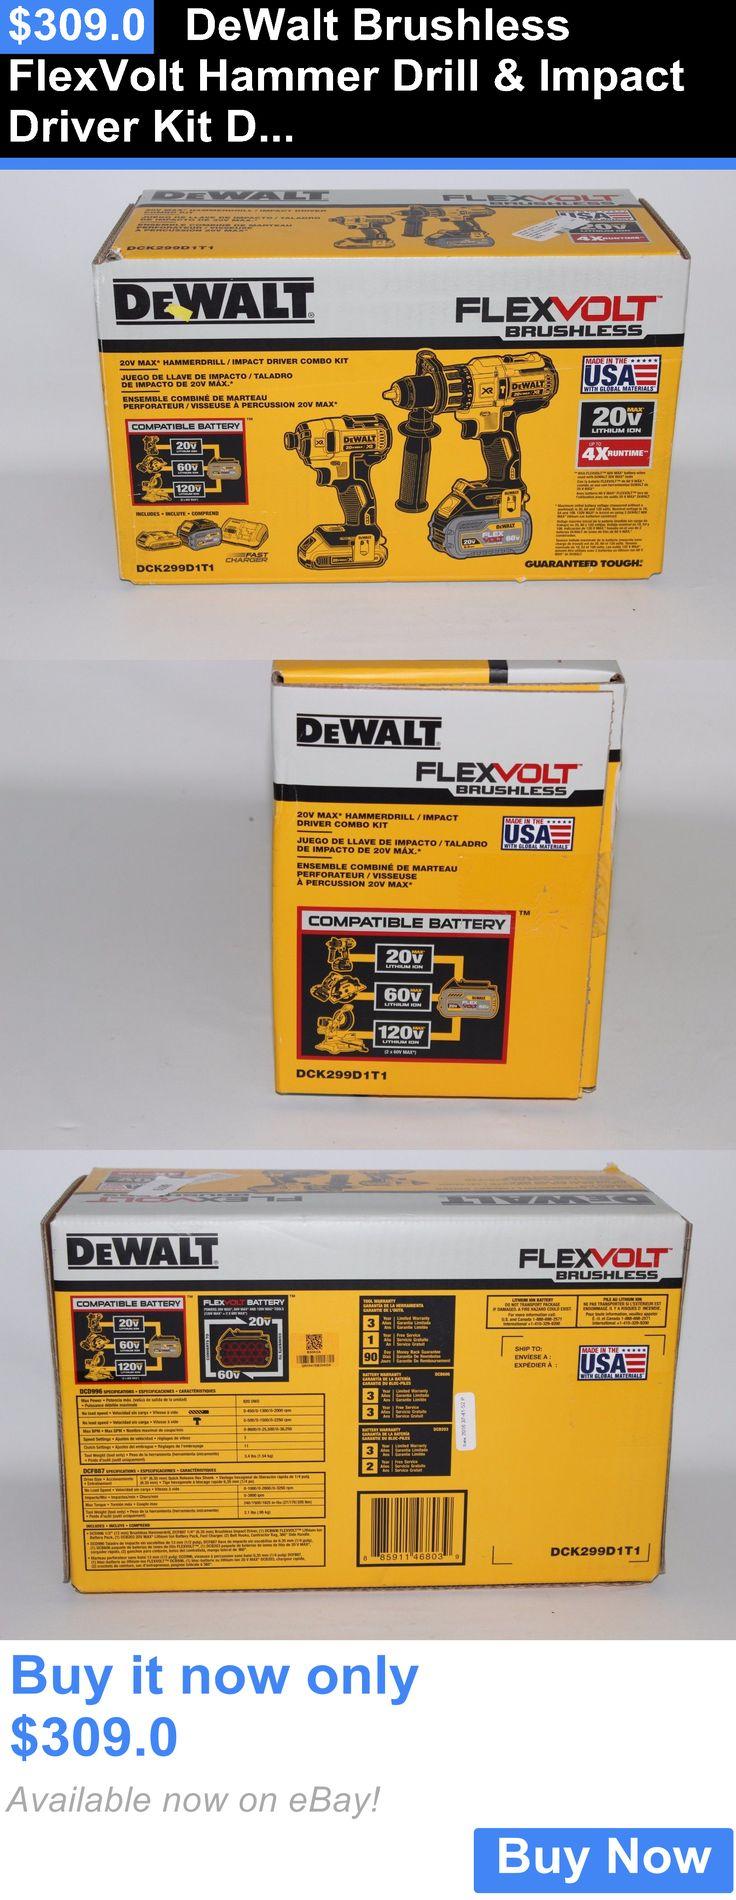 tools: Dewalt Brushless Flexvolt Hammer Drill And Impact Driver Kit Dck299d1t1 New BUY IT NOW ONLY: $309.0